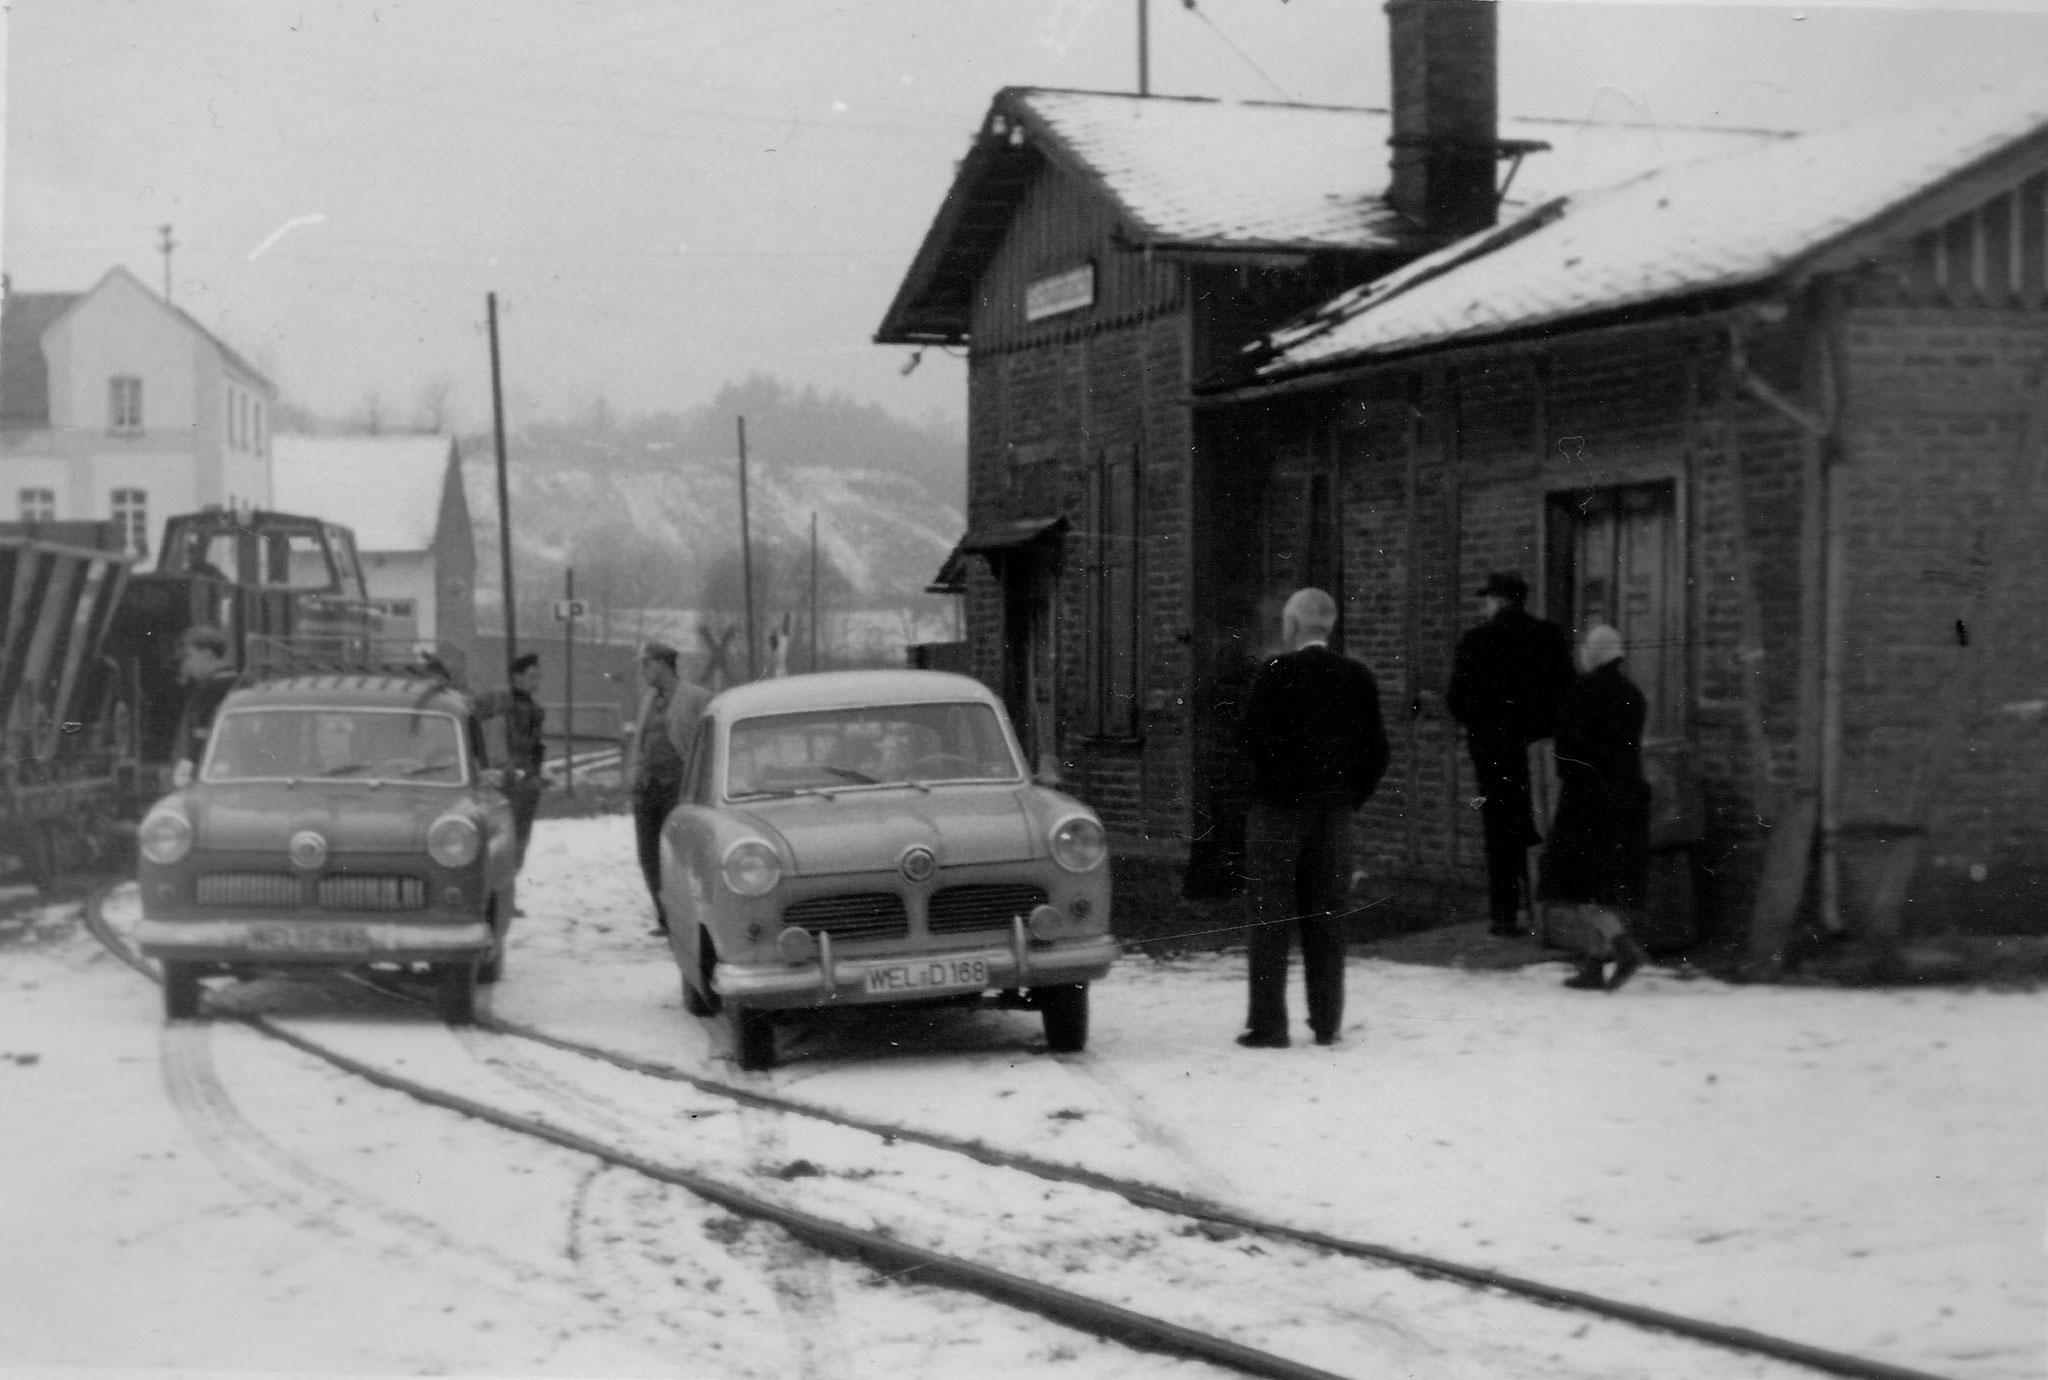 Parken vor den Bahnhof? Kein Problem 1959                               Foto Würges